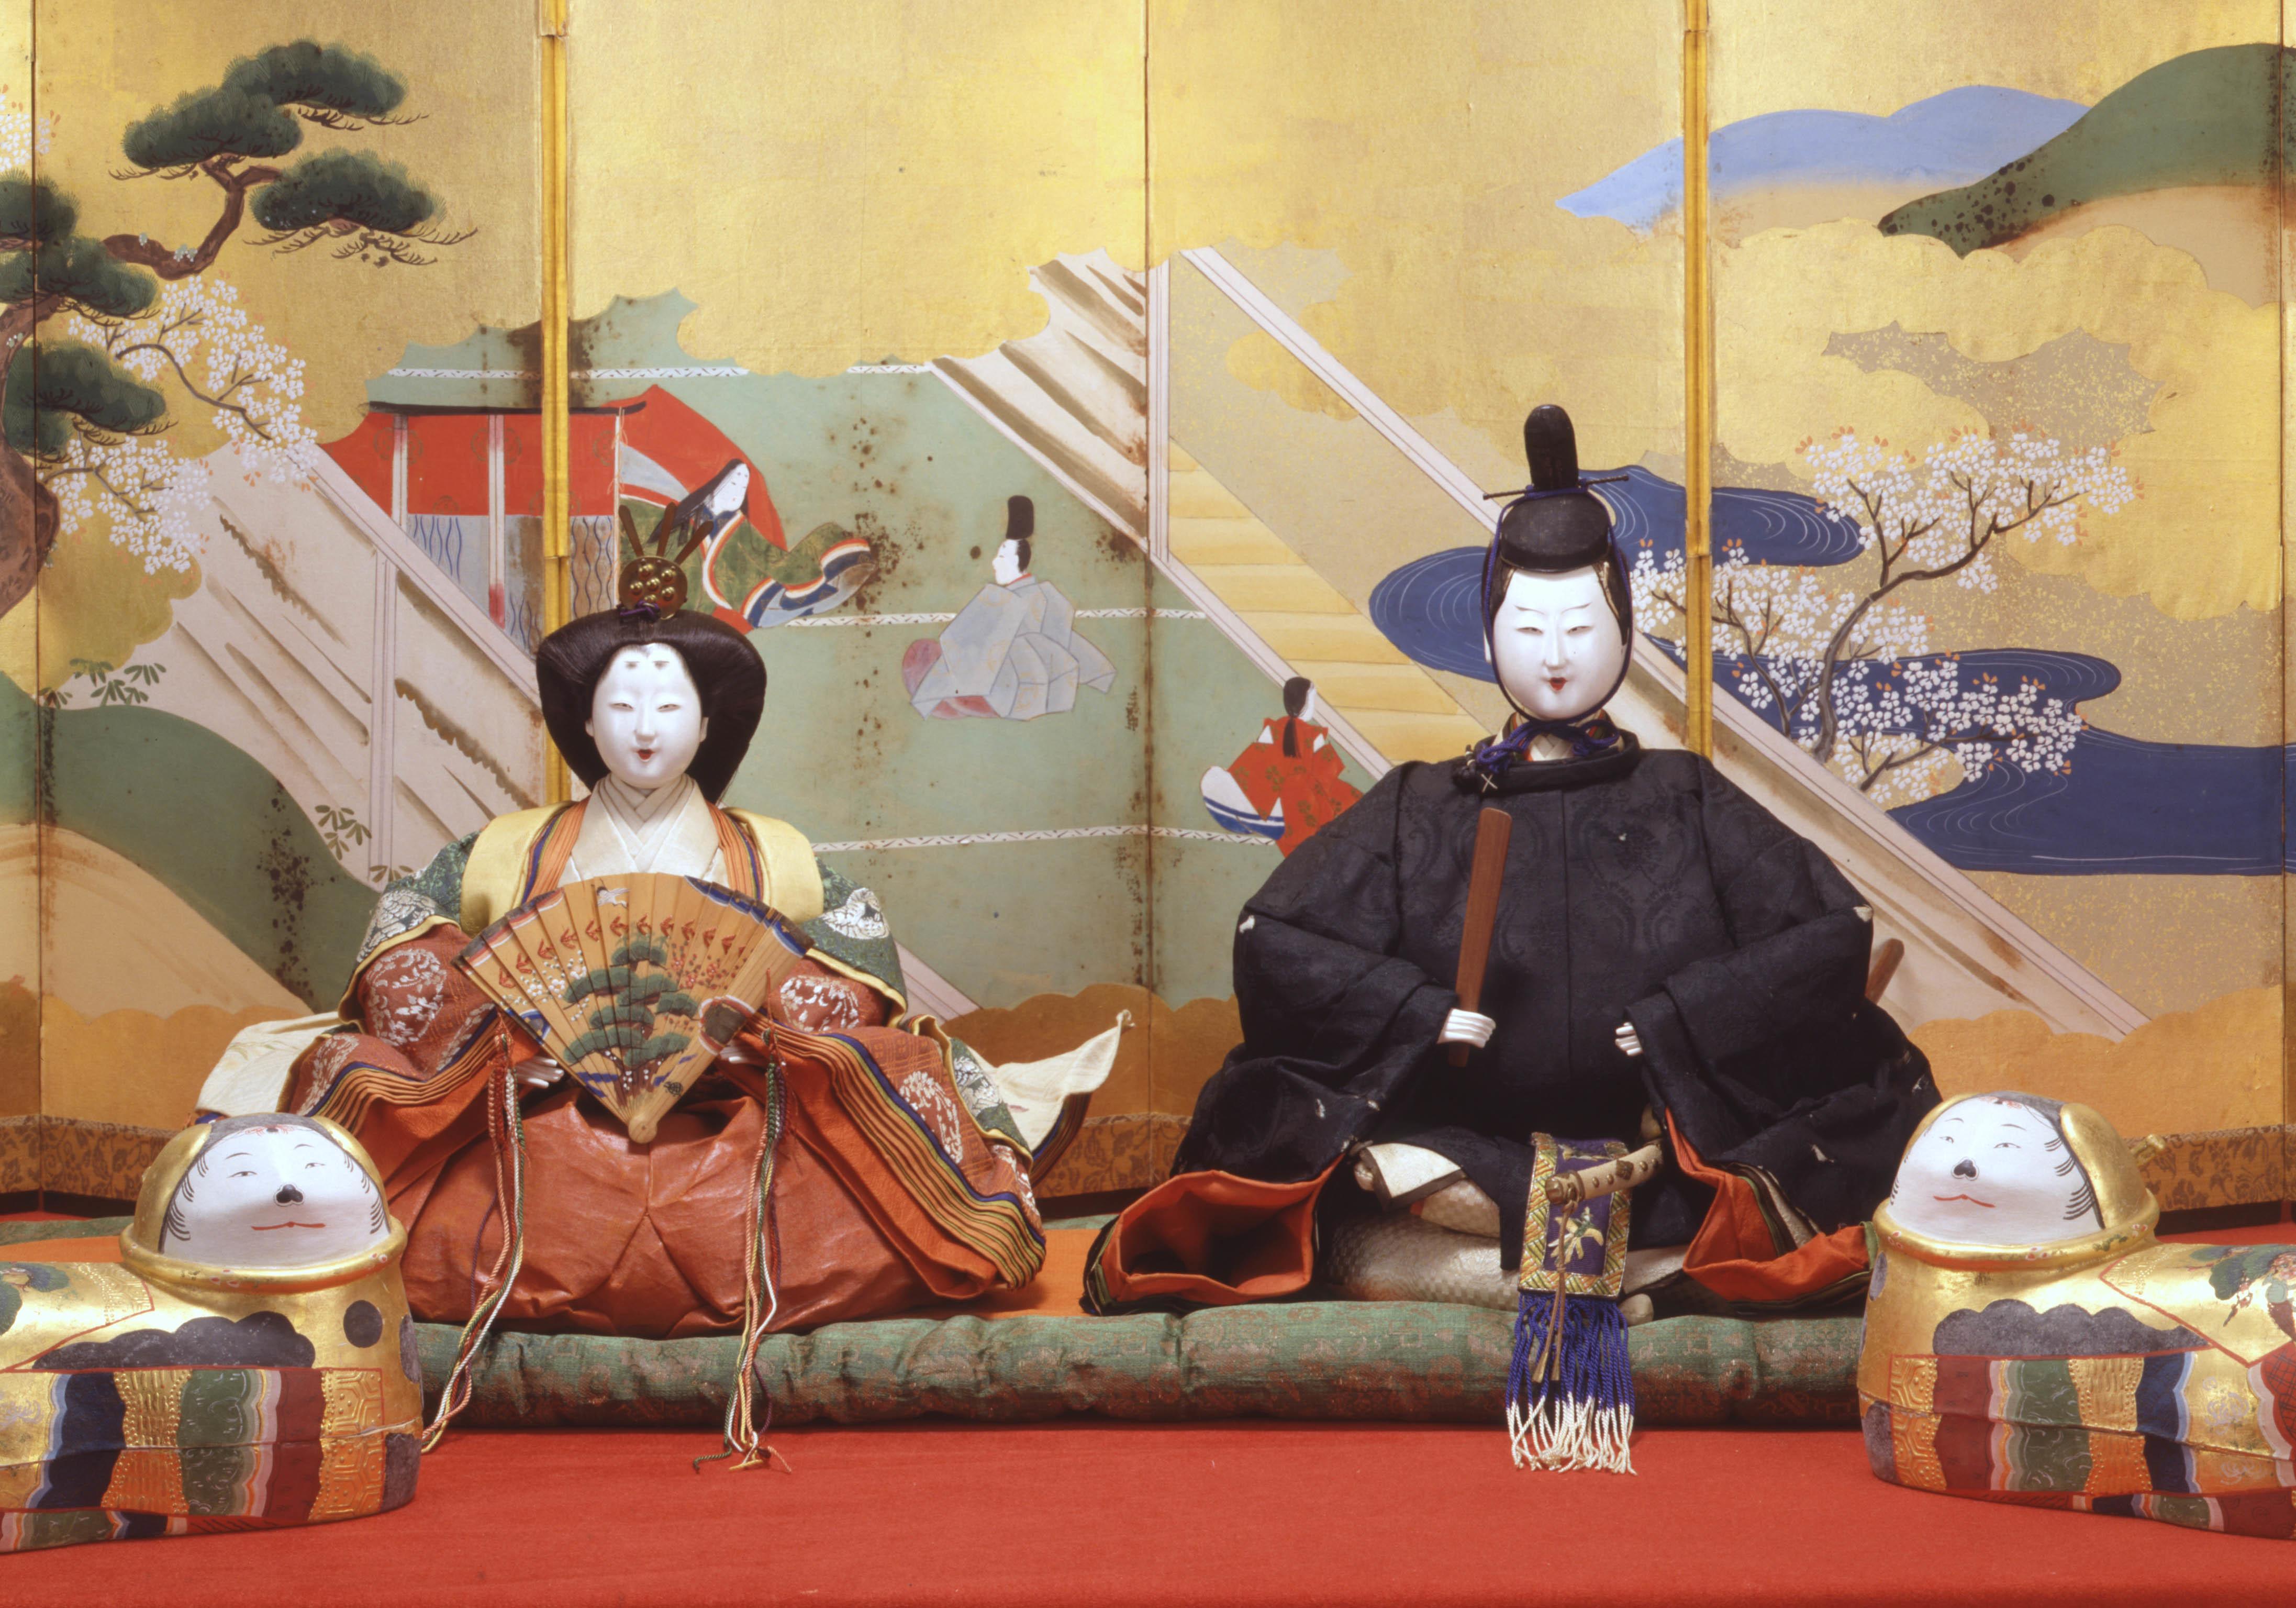 内裏雛飾り 徳川美術館蔵